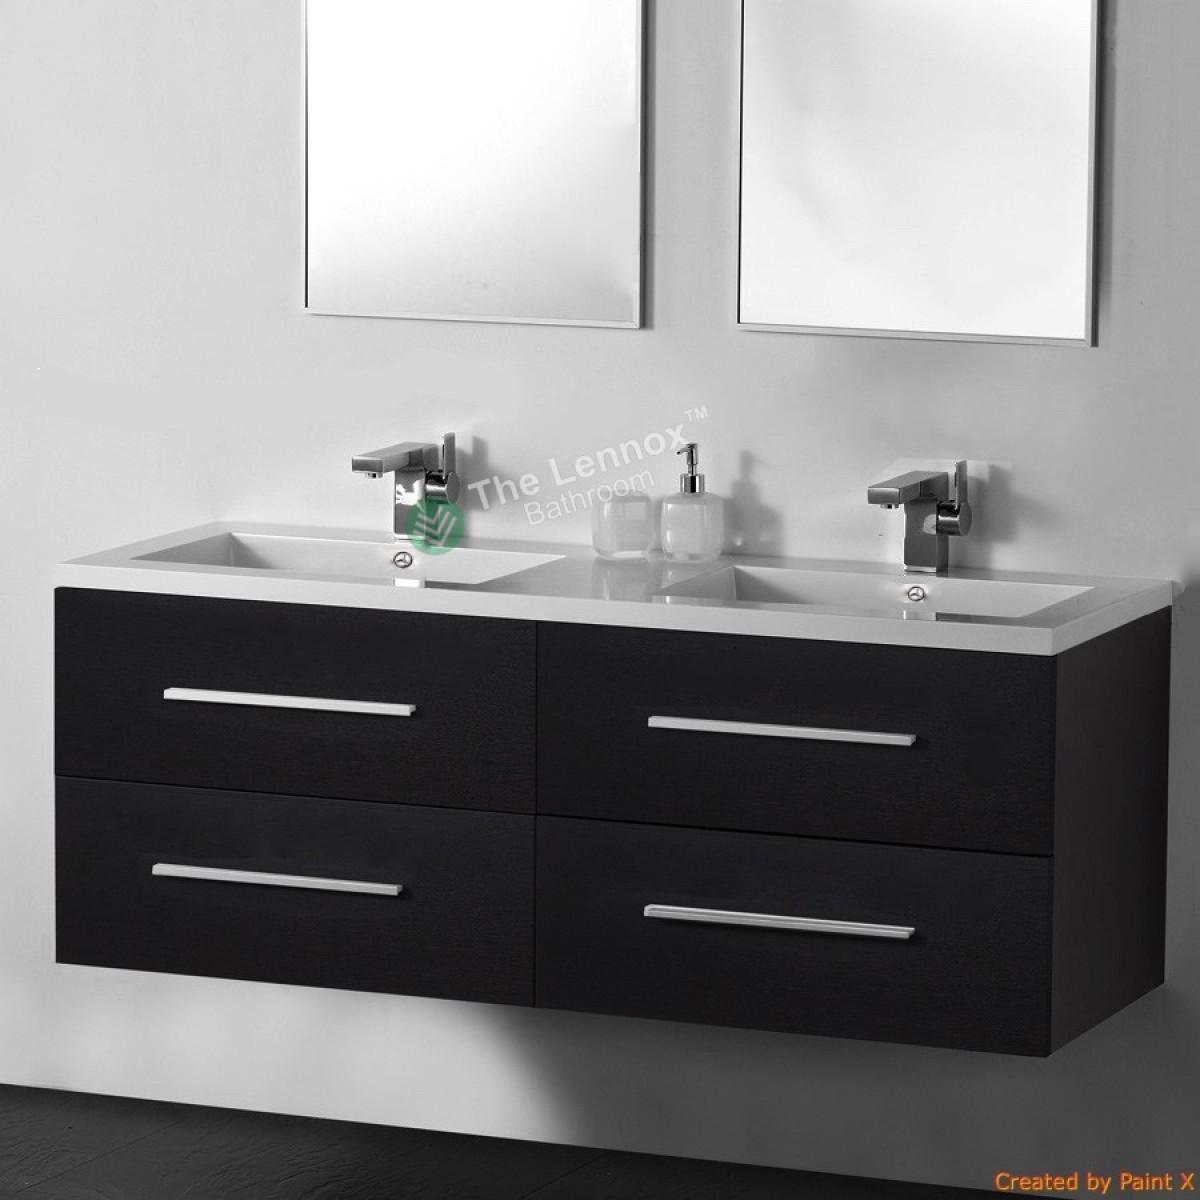 Bathroom Vanity Units New Zealand wall hung vanity